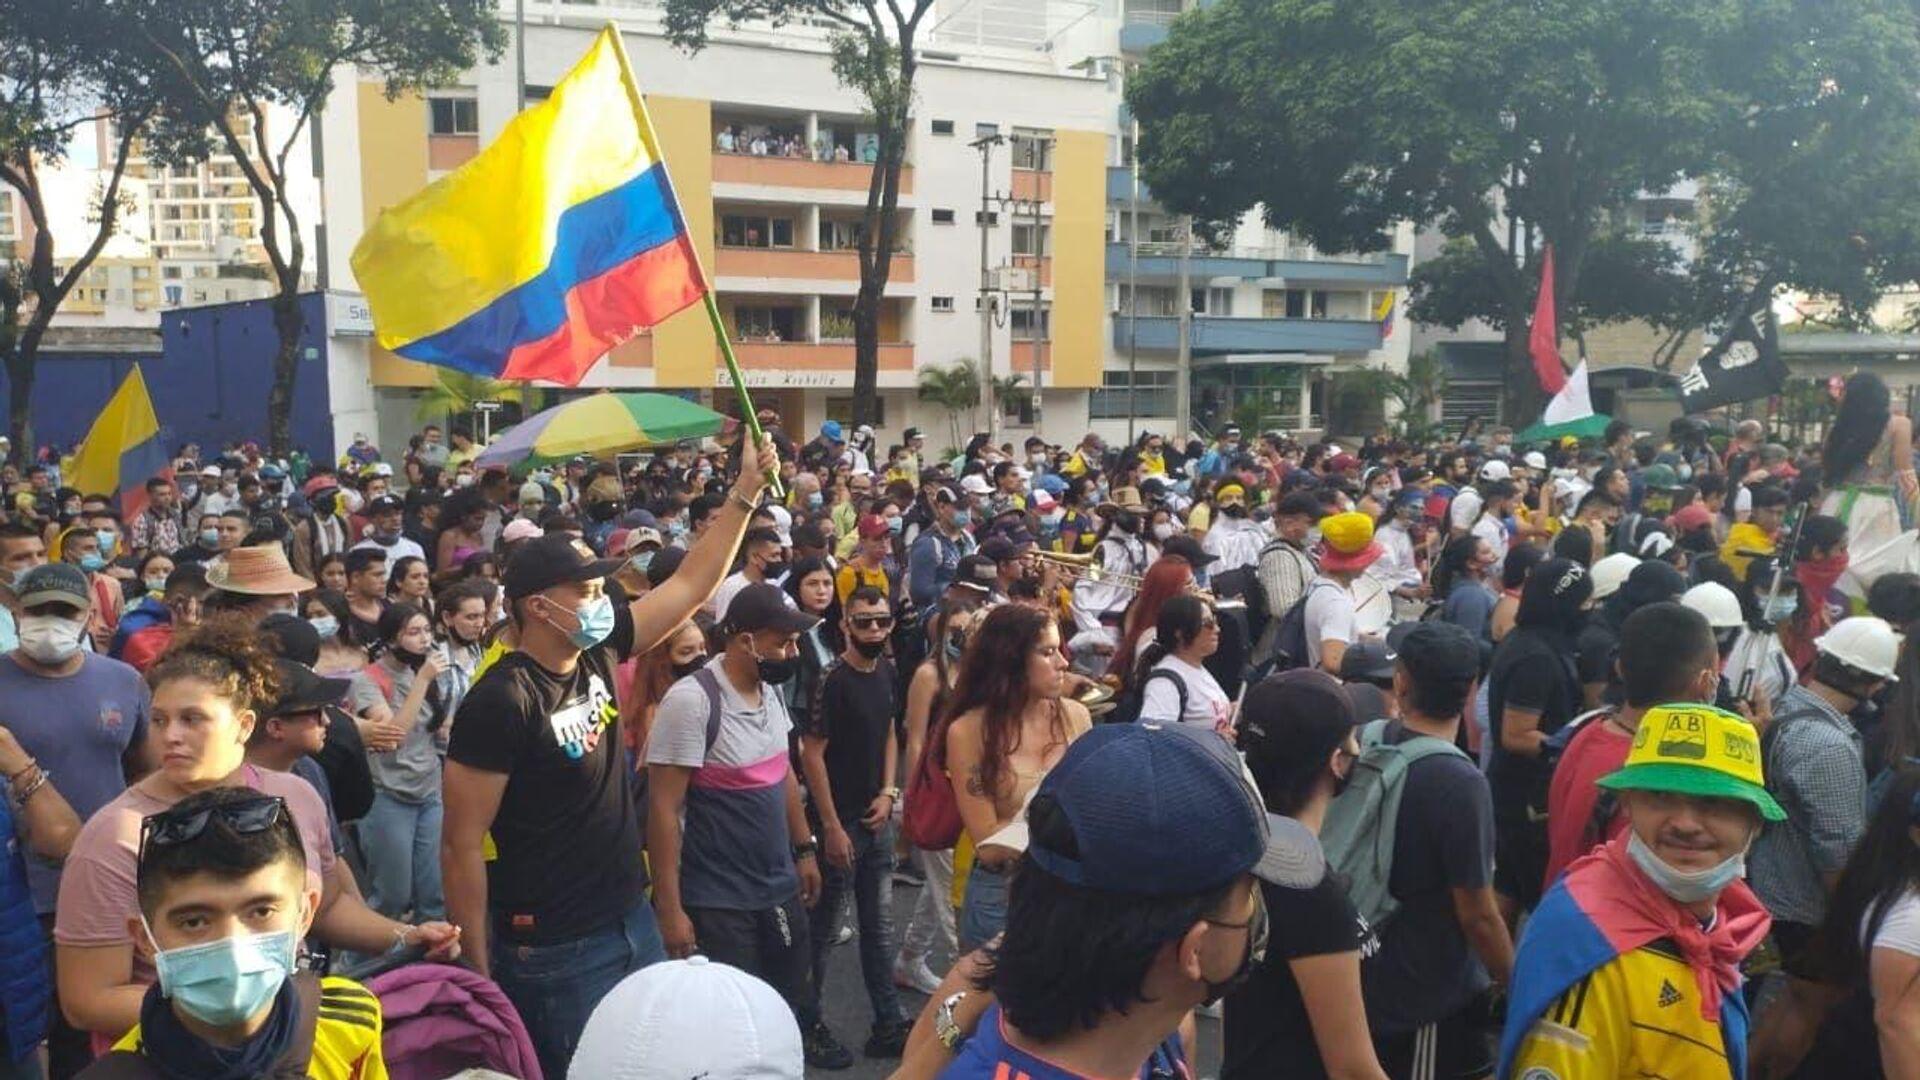 Manifestación en Bucaramanga, Colombia - Sputnik Mundo, 1920, 21.07.2021